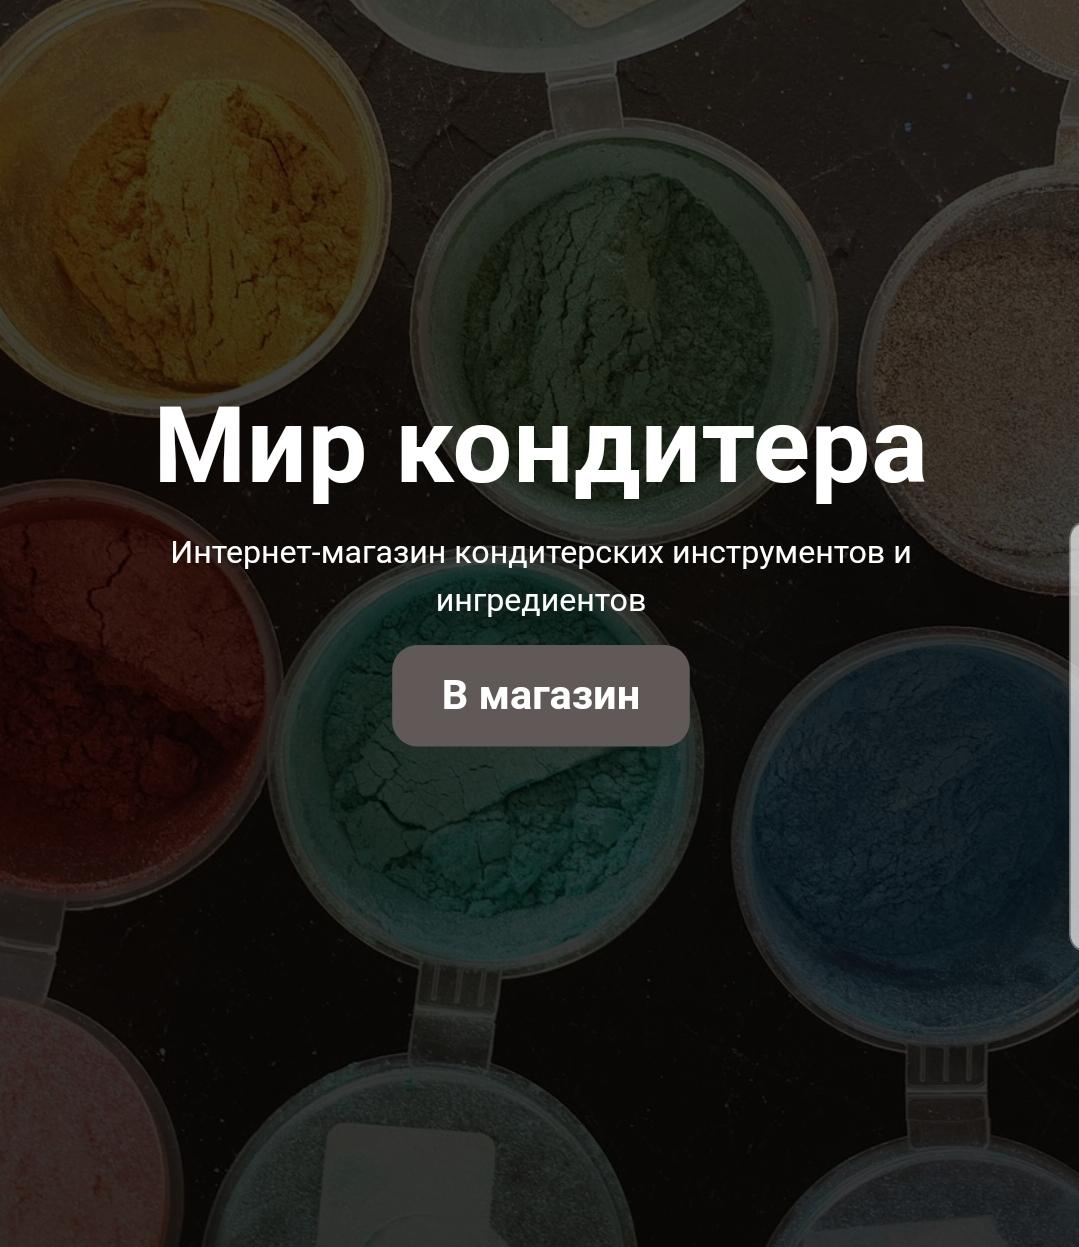 Кондитерский Интернет Магазин Волгоград